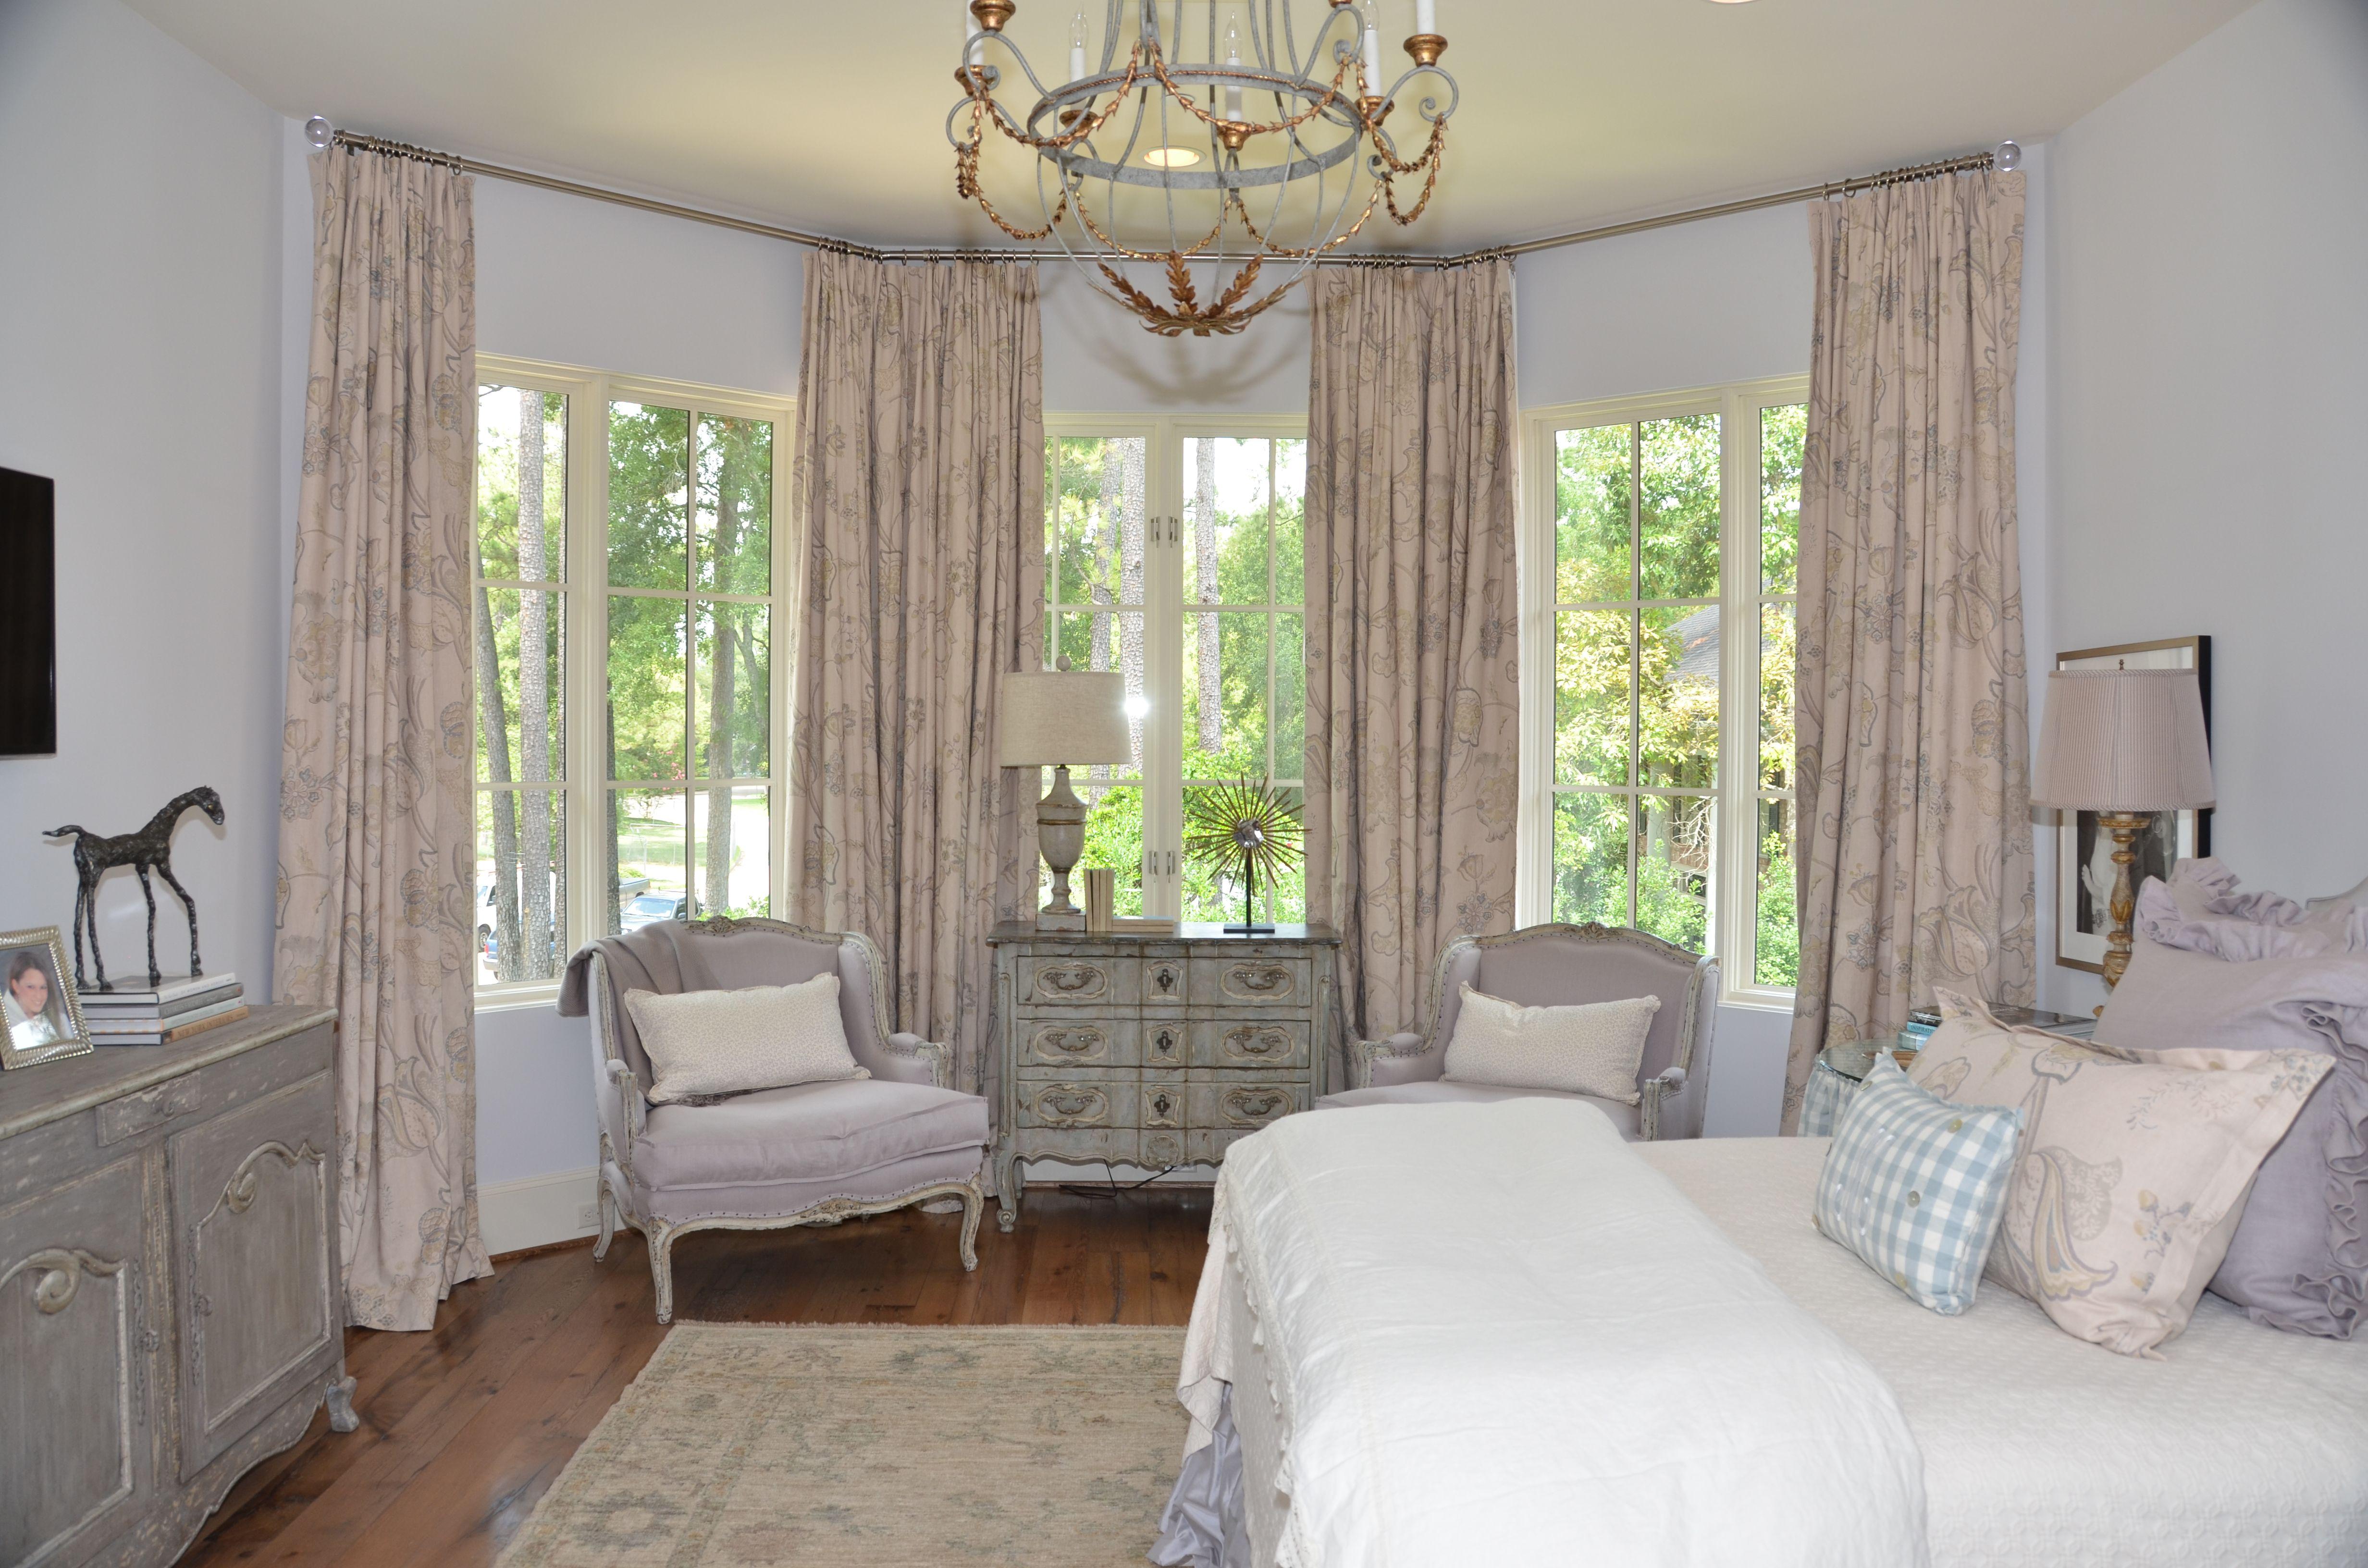 Bed on bay window  cindy witmer designs  amazing interiors  pinterest  bay window